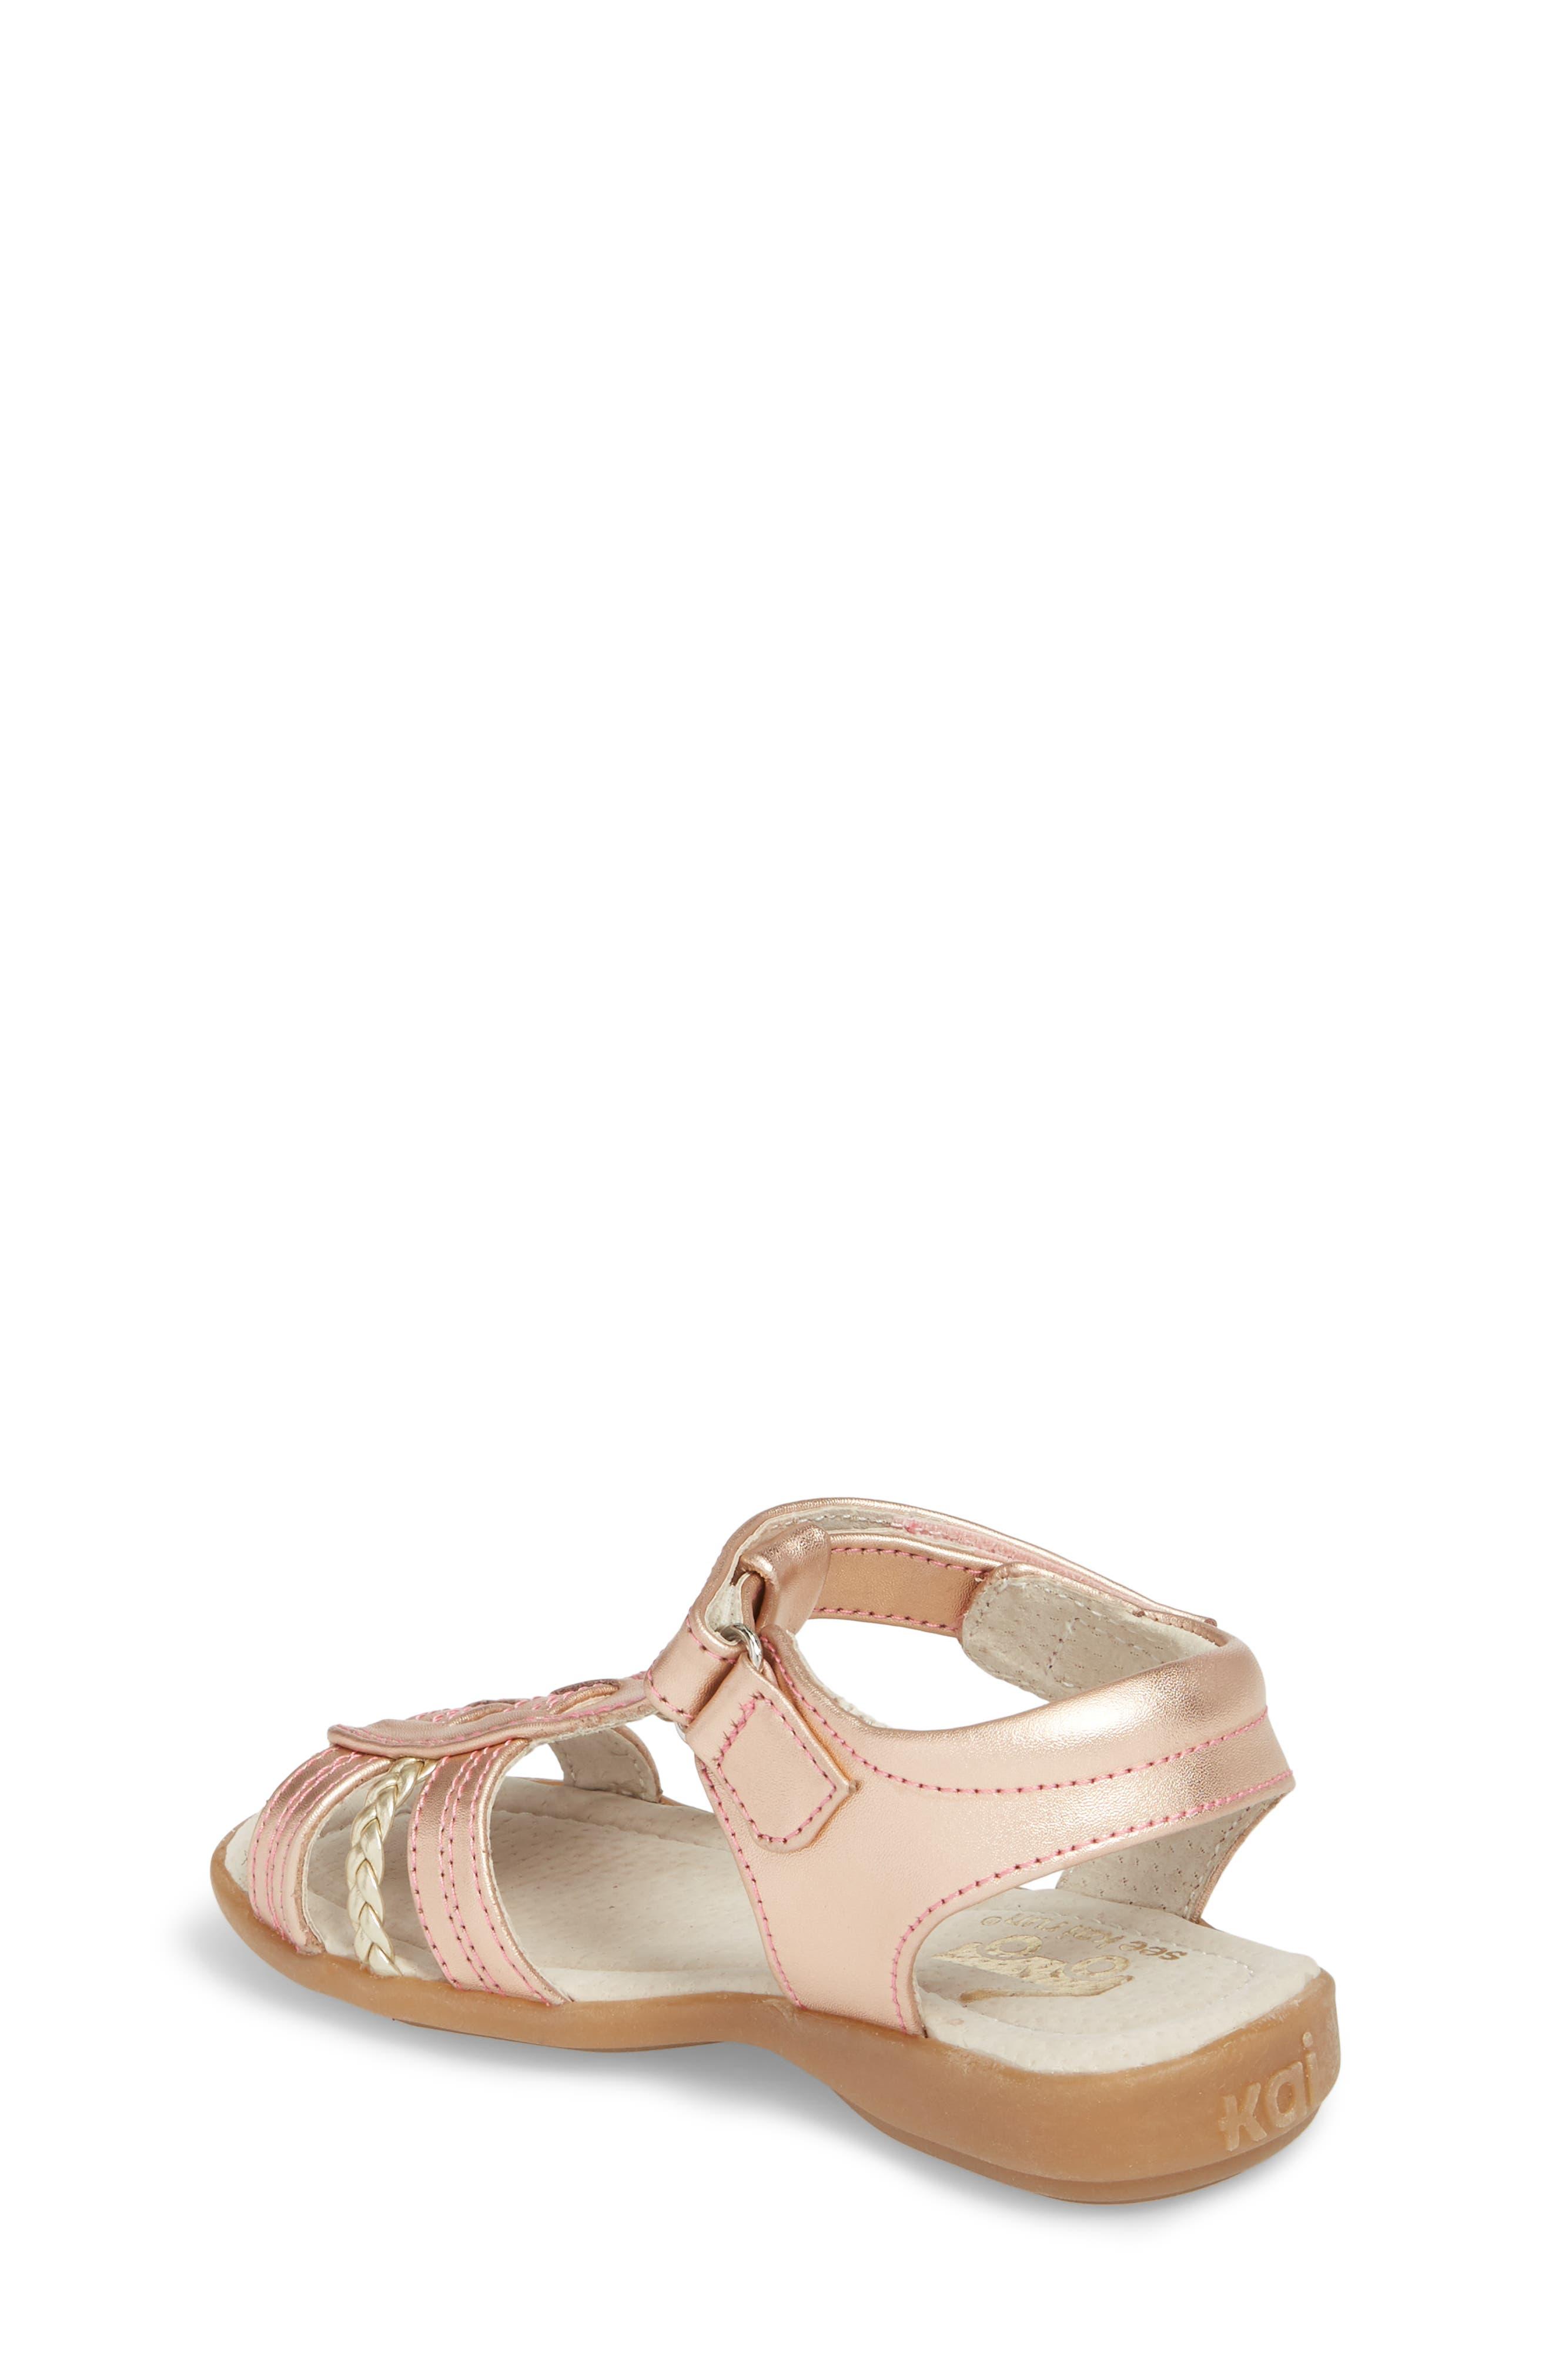 Hadley Metallic Sandal,                             Alternate thumbnail 2, color,                             Rose Gold